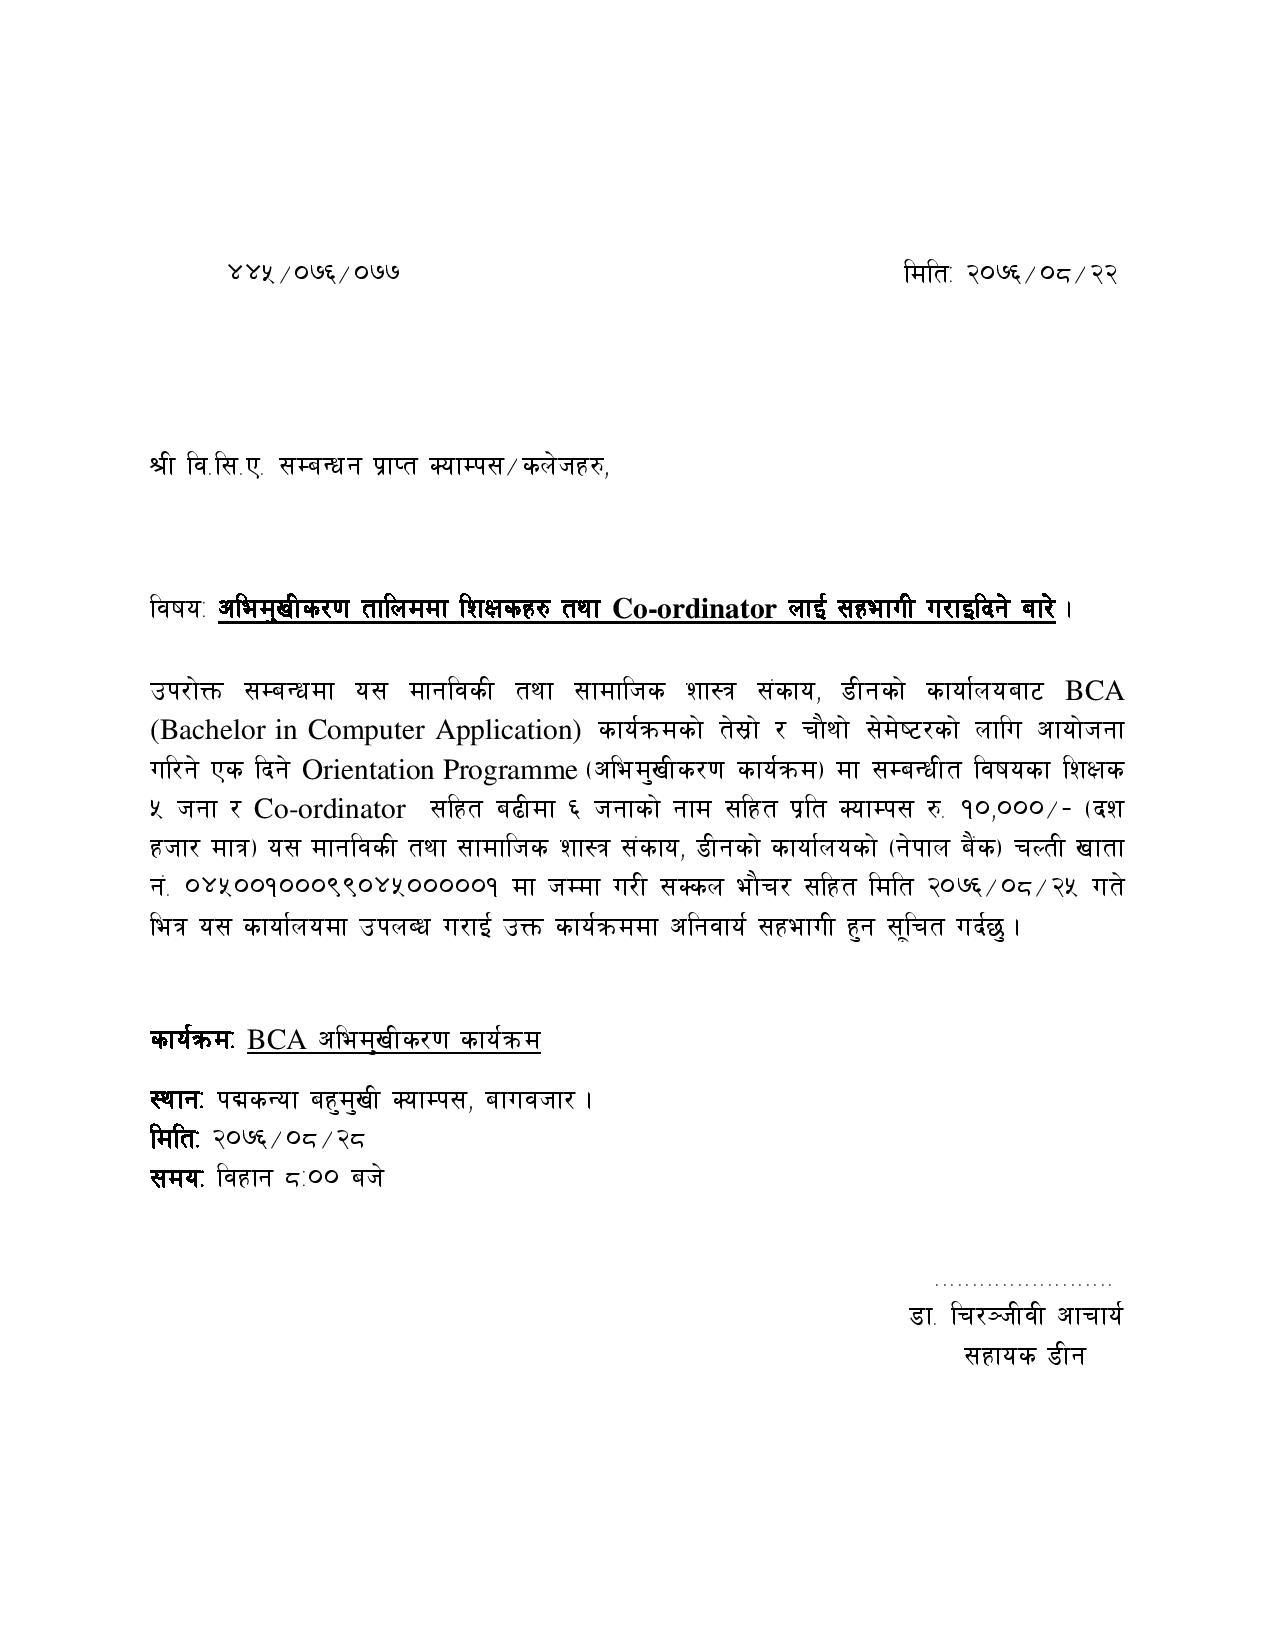 Notice for BCA orientation program at Padmakanya Campus.